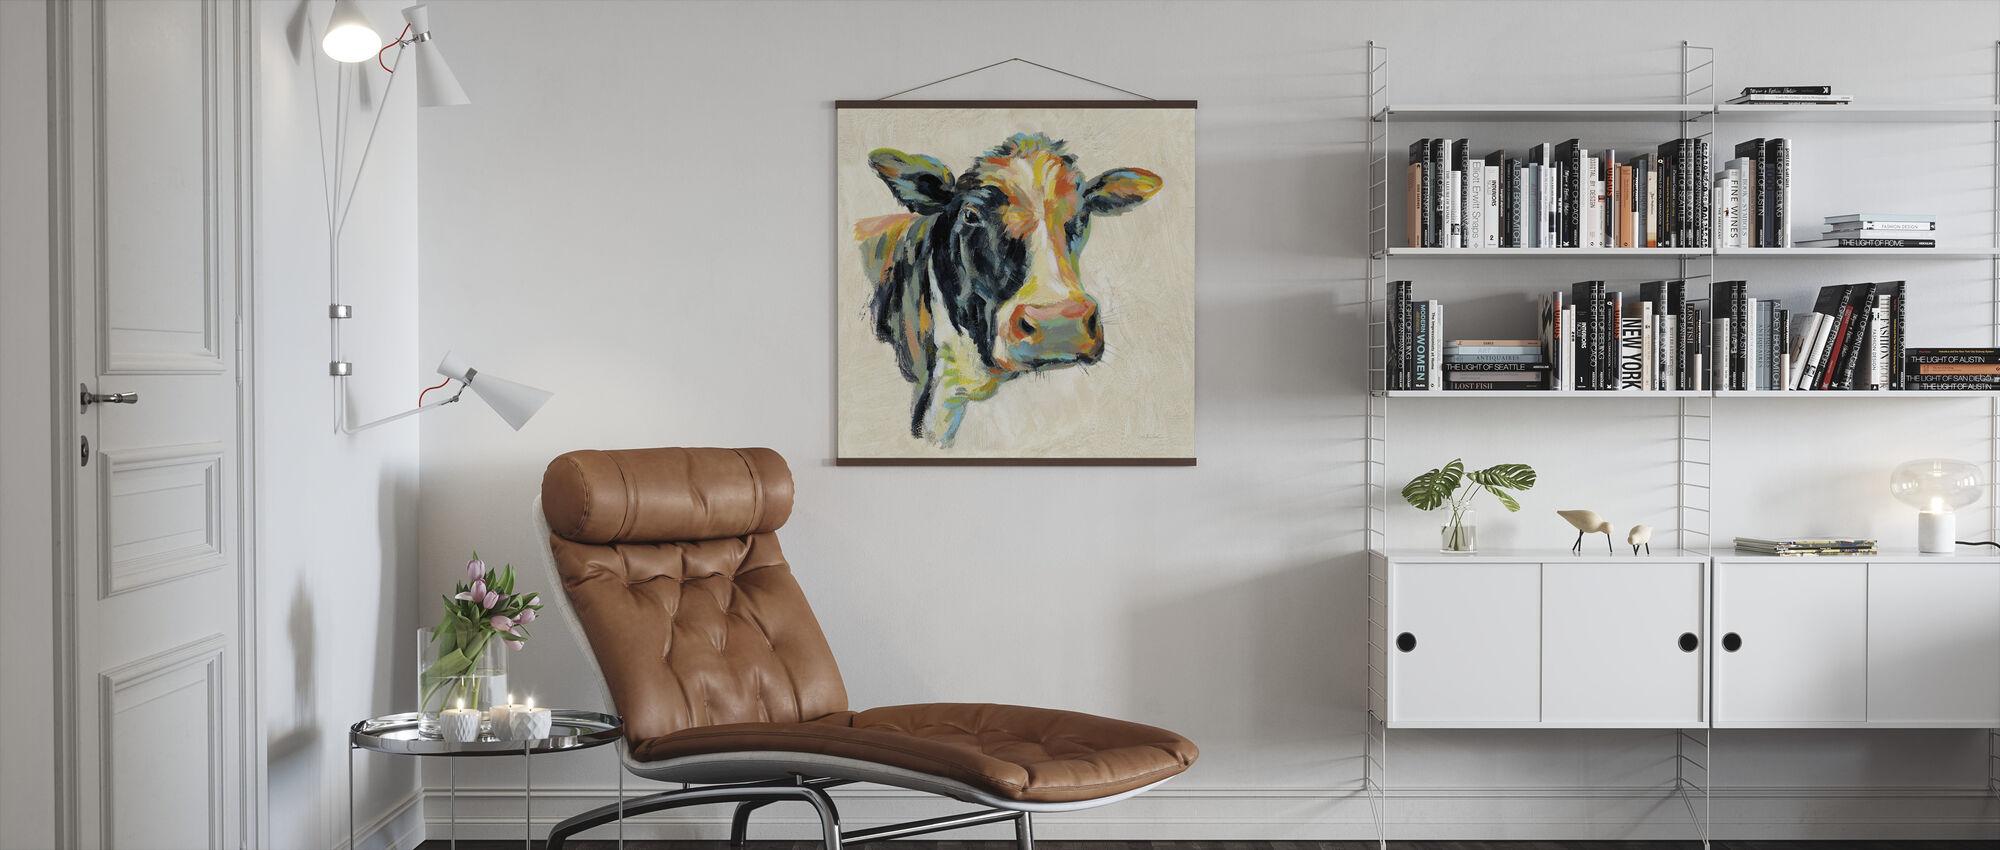 Expressionistische Koe I - Poster - Woonkamer